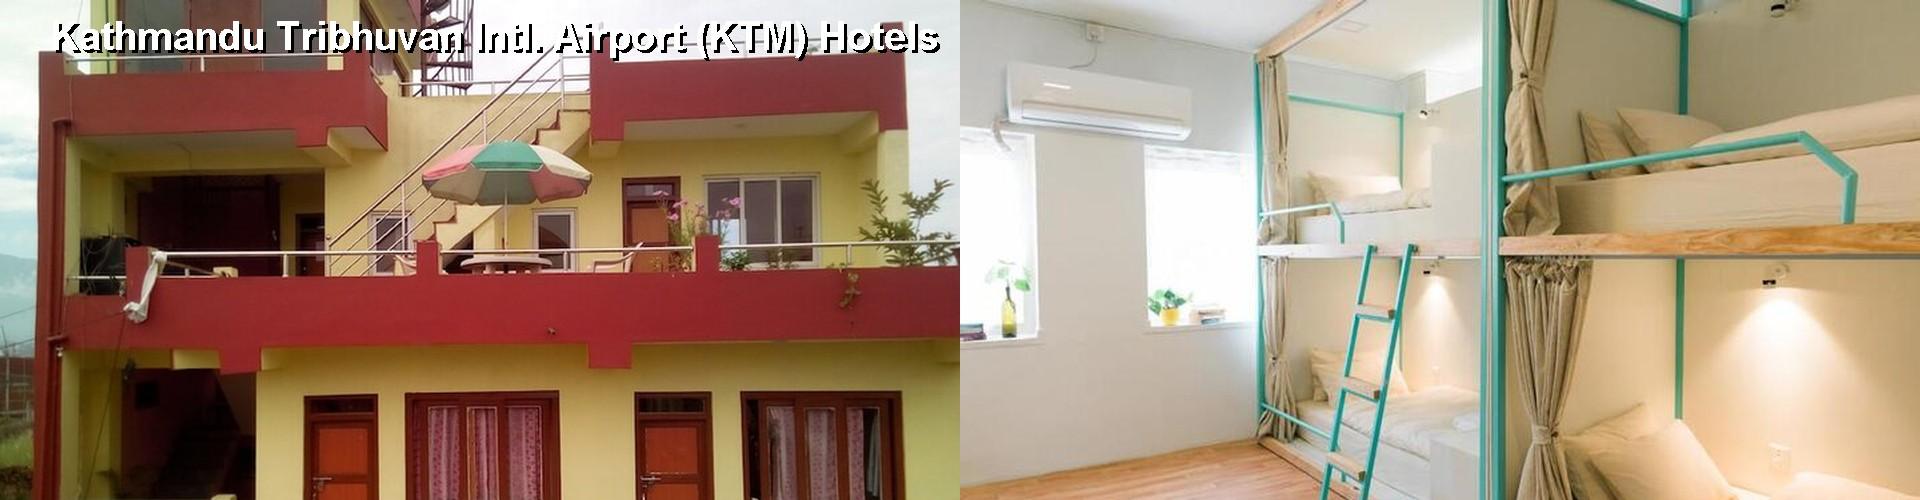 5 Best Hotels Near Kathmandu Tribhuvan Intl Airport Ktm